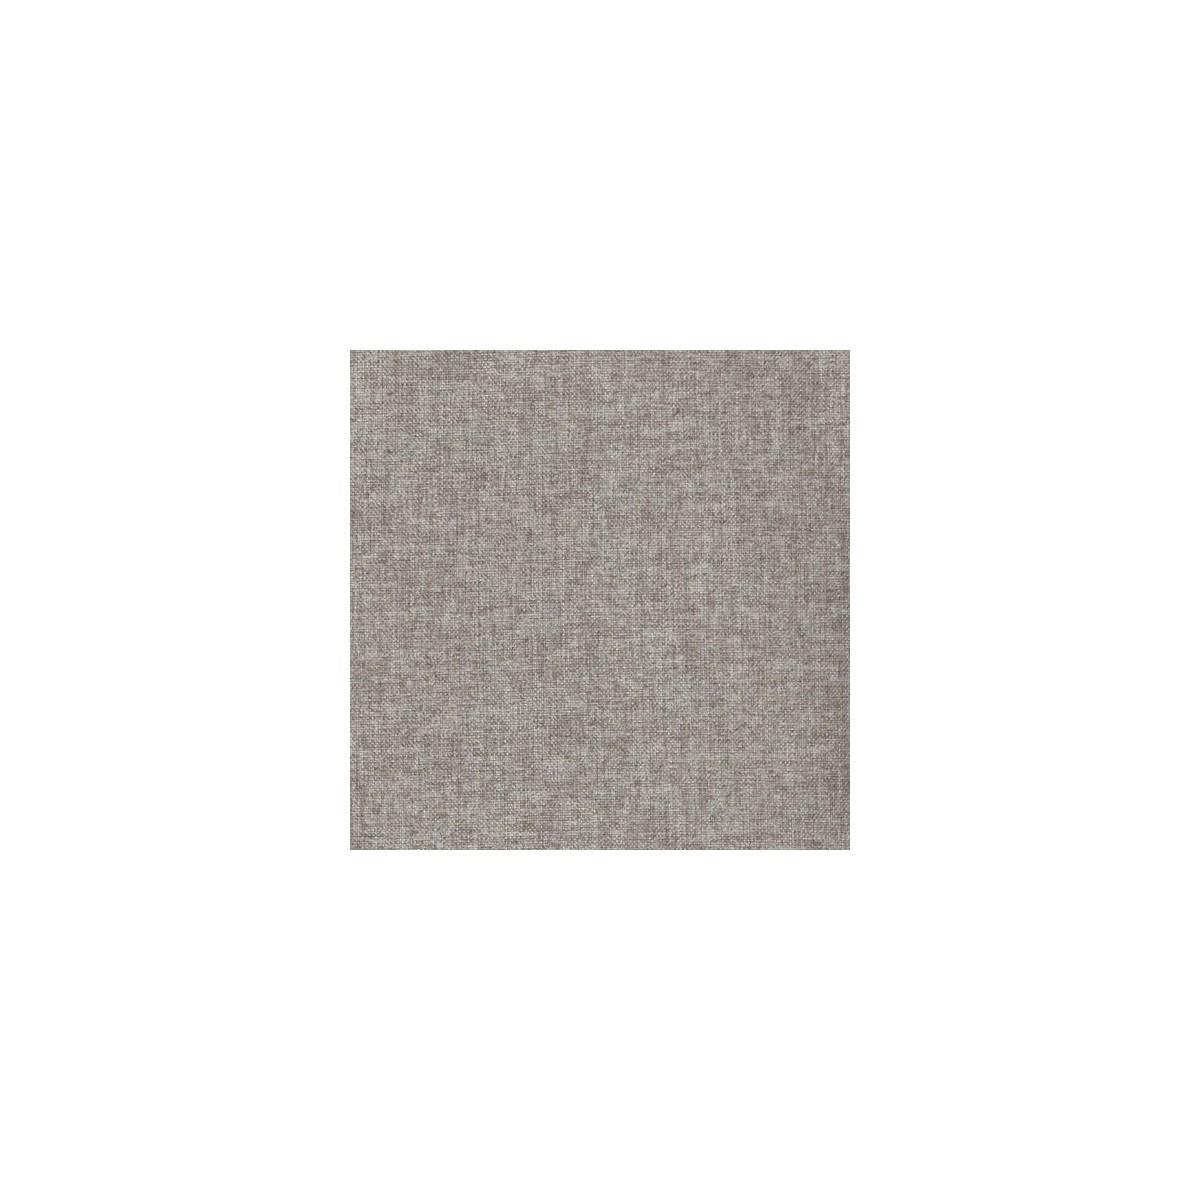 Alberta - Flax - Fabric By the Yard